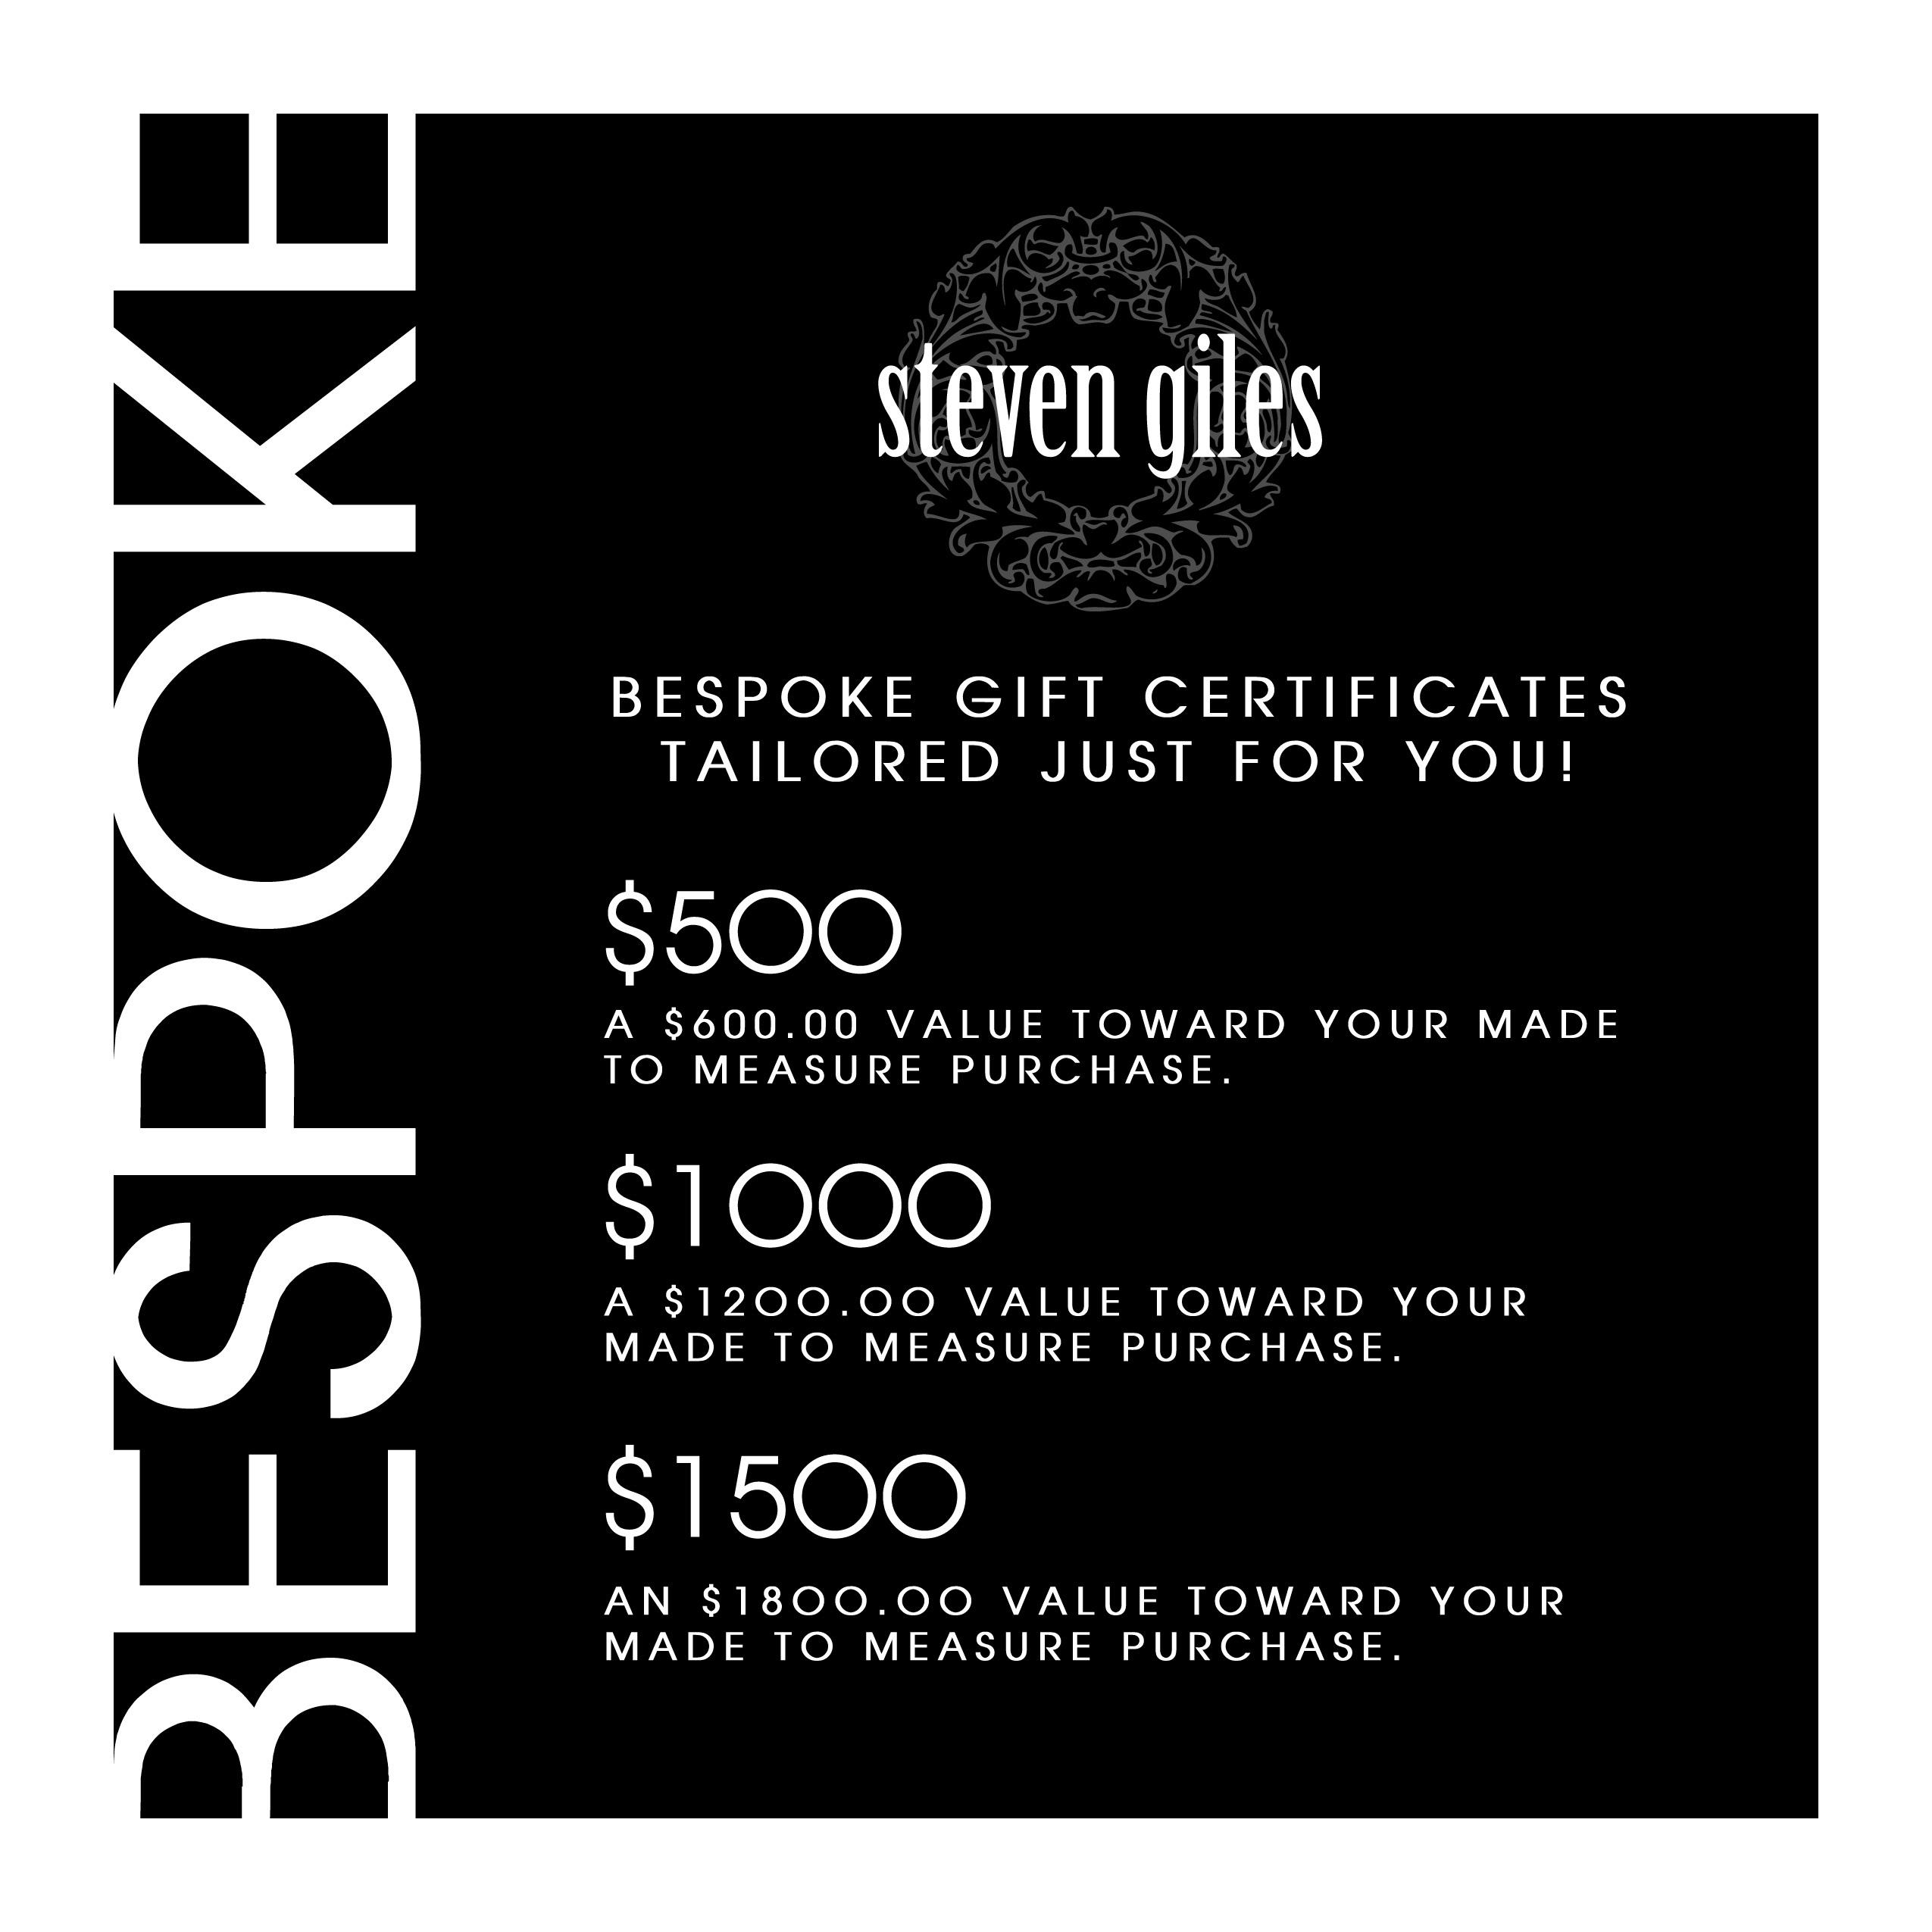 Bespoke Gift Certificates